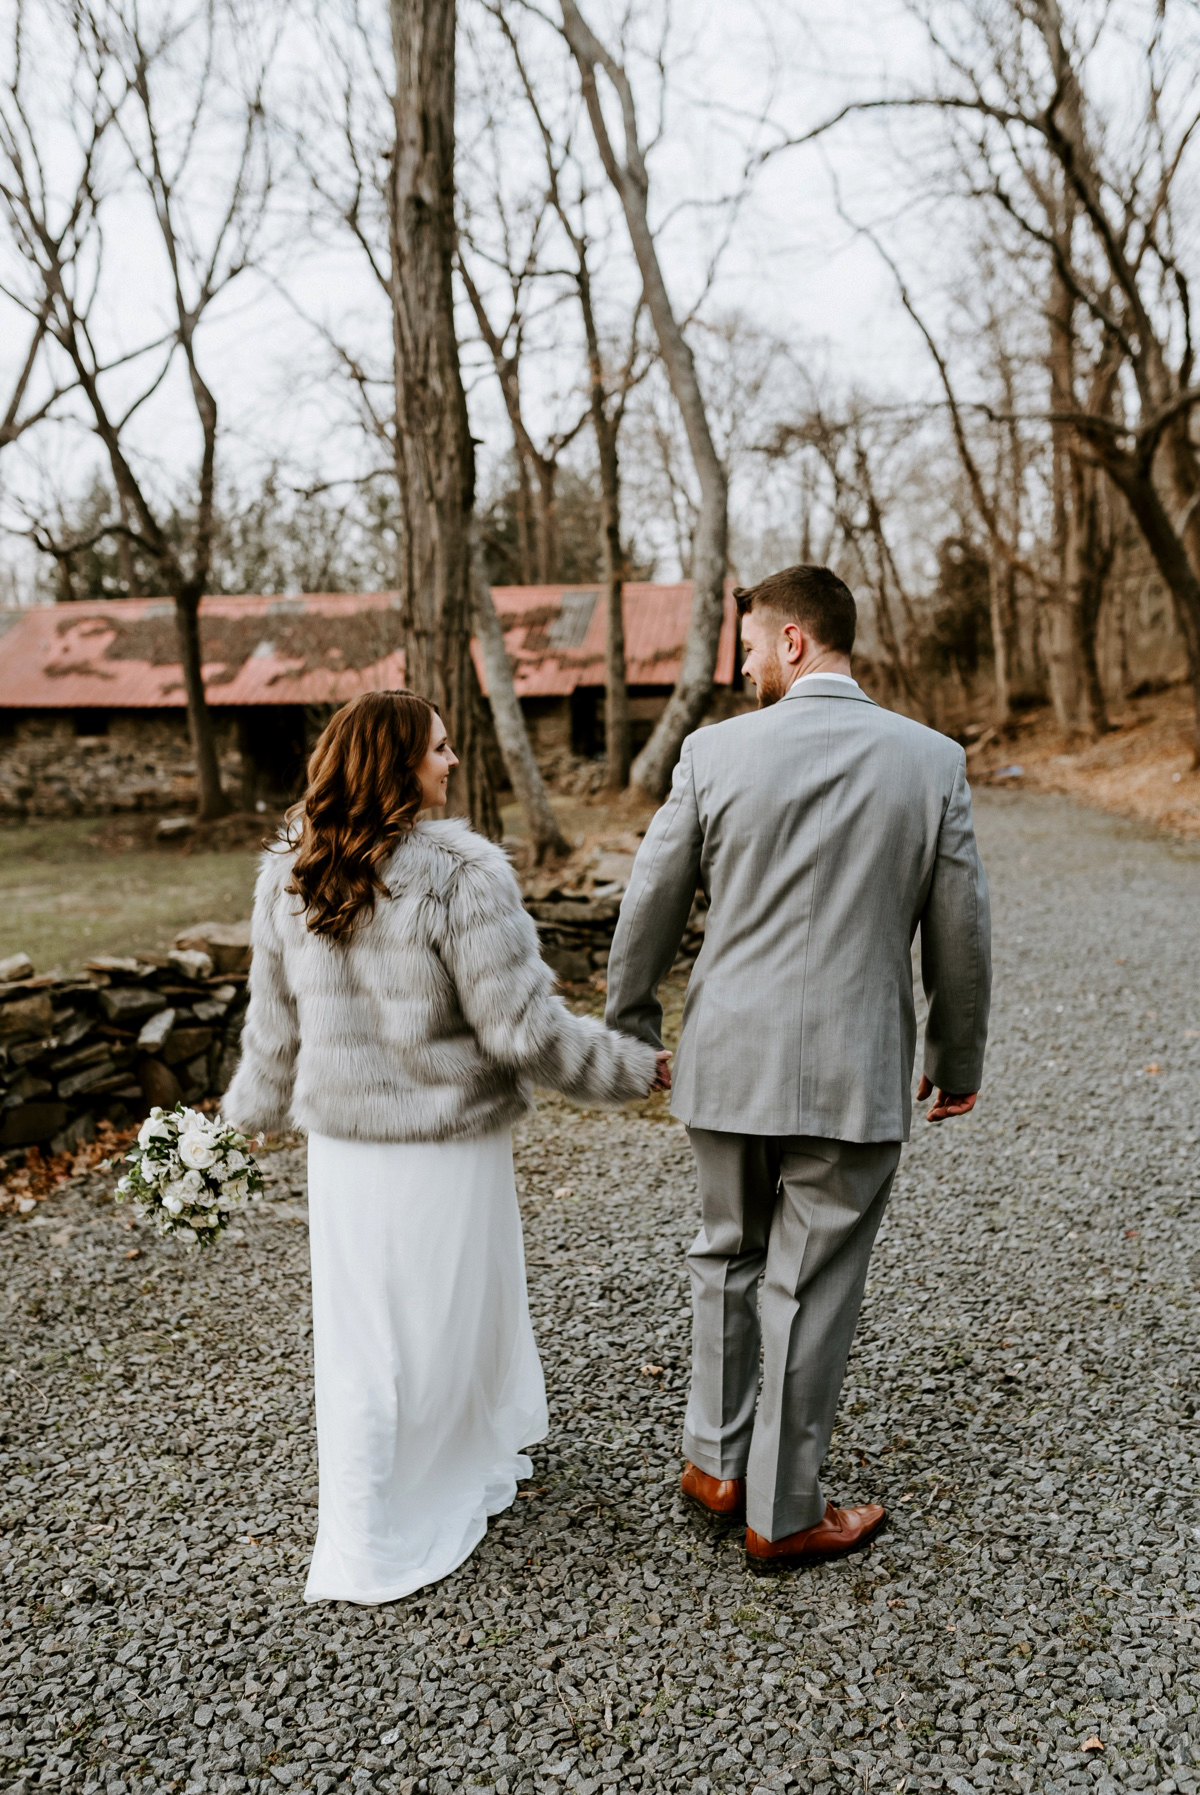 47 The Inn At Glencairn Winter Wedding Inspiration Winter Elopement Princeton Wedding Photographer NJ Wedding Photographer